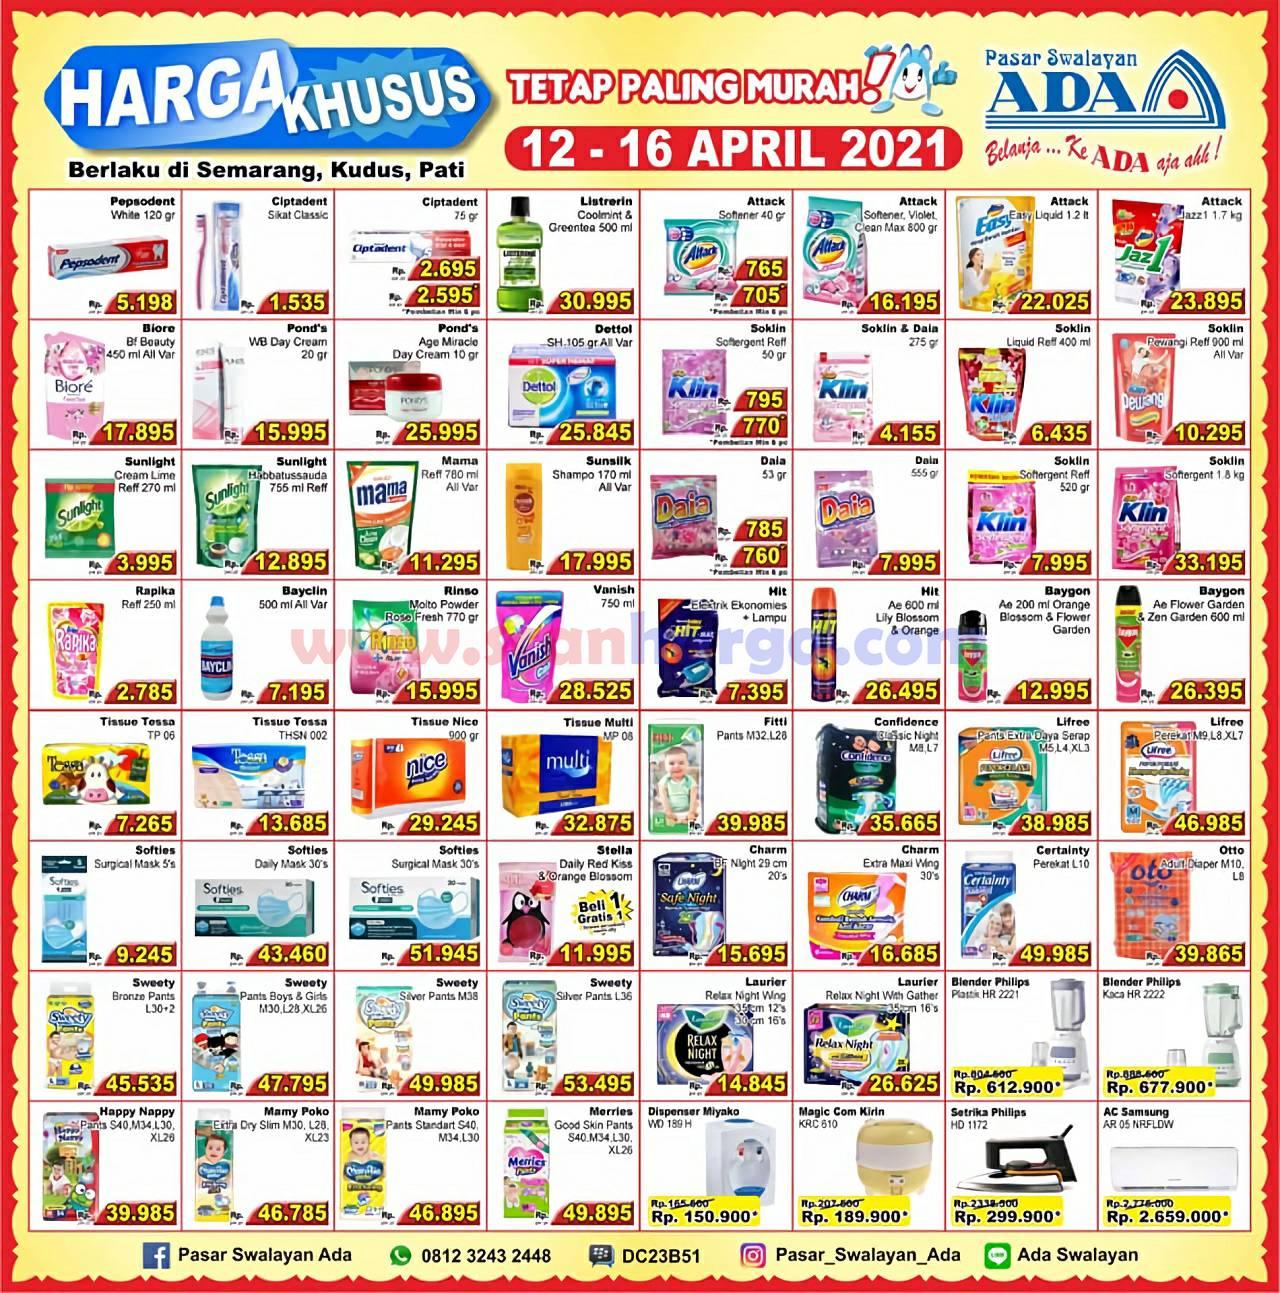 Promo Katalog Ada Swalayan Weekday Harga Khusus 12 - 16 April 2021 2